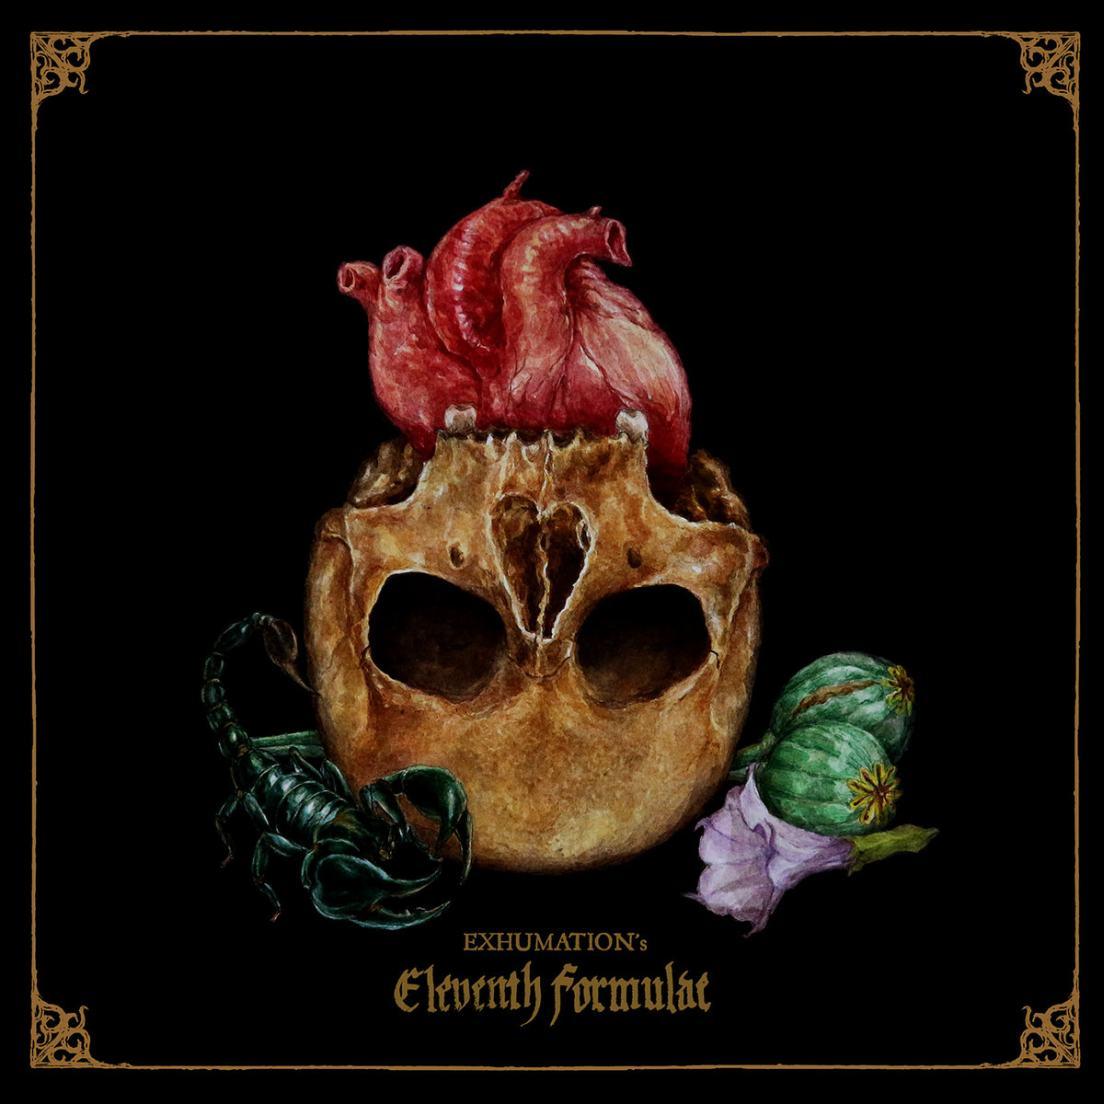 Exhumation - Eleventh Formulae